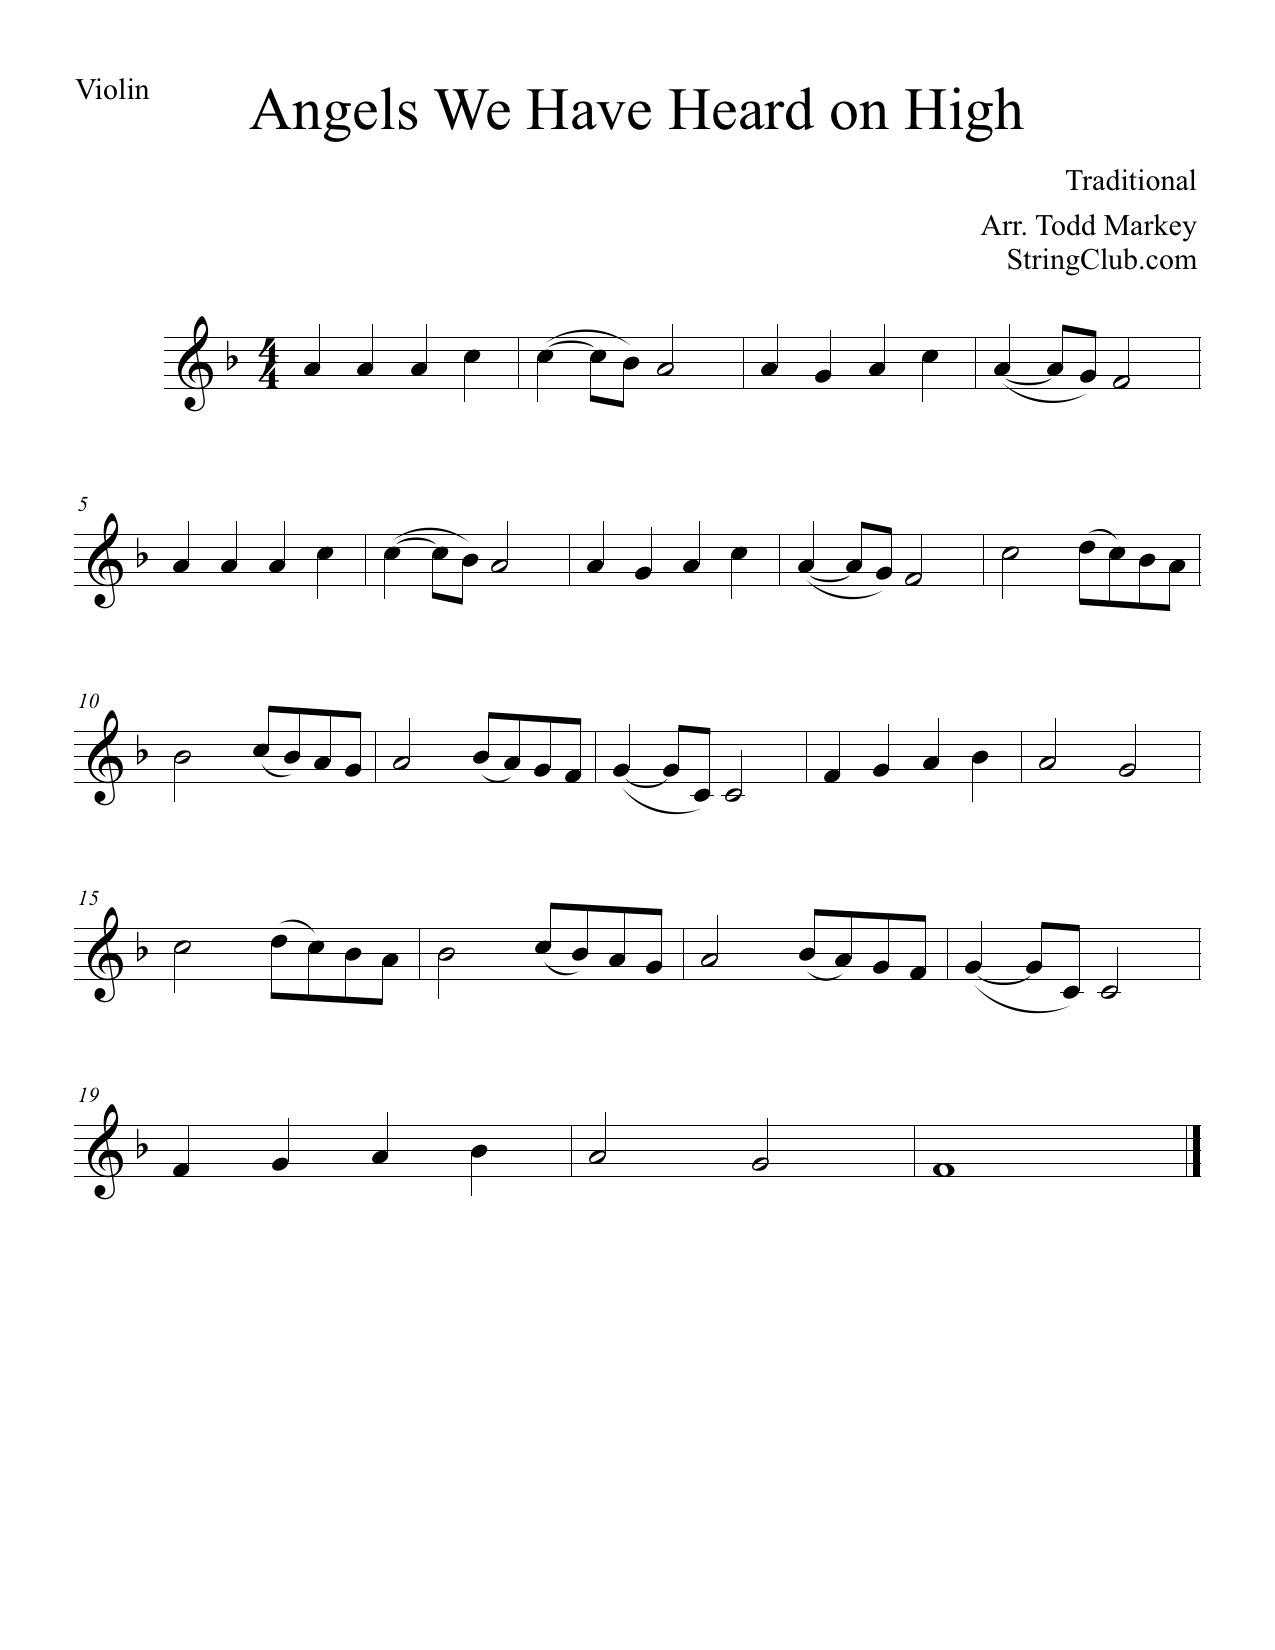 angels we have heard on high lyrics pdf